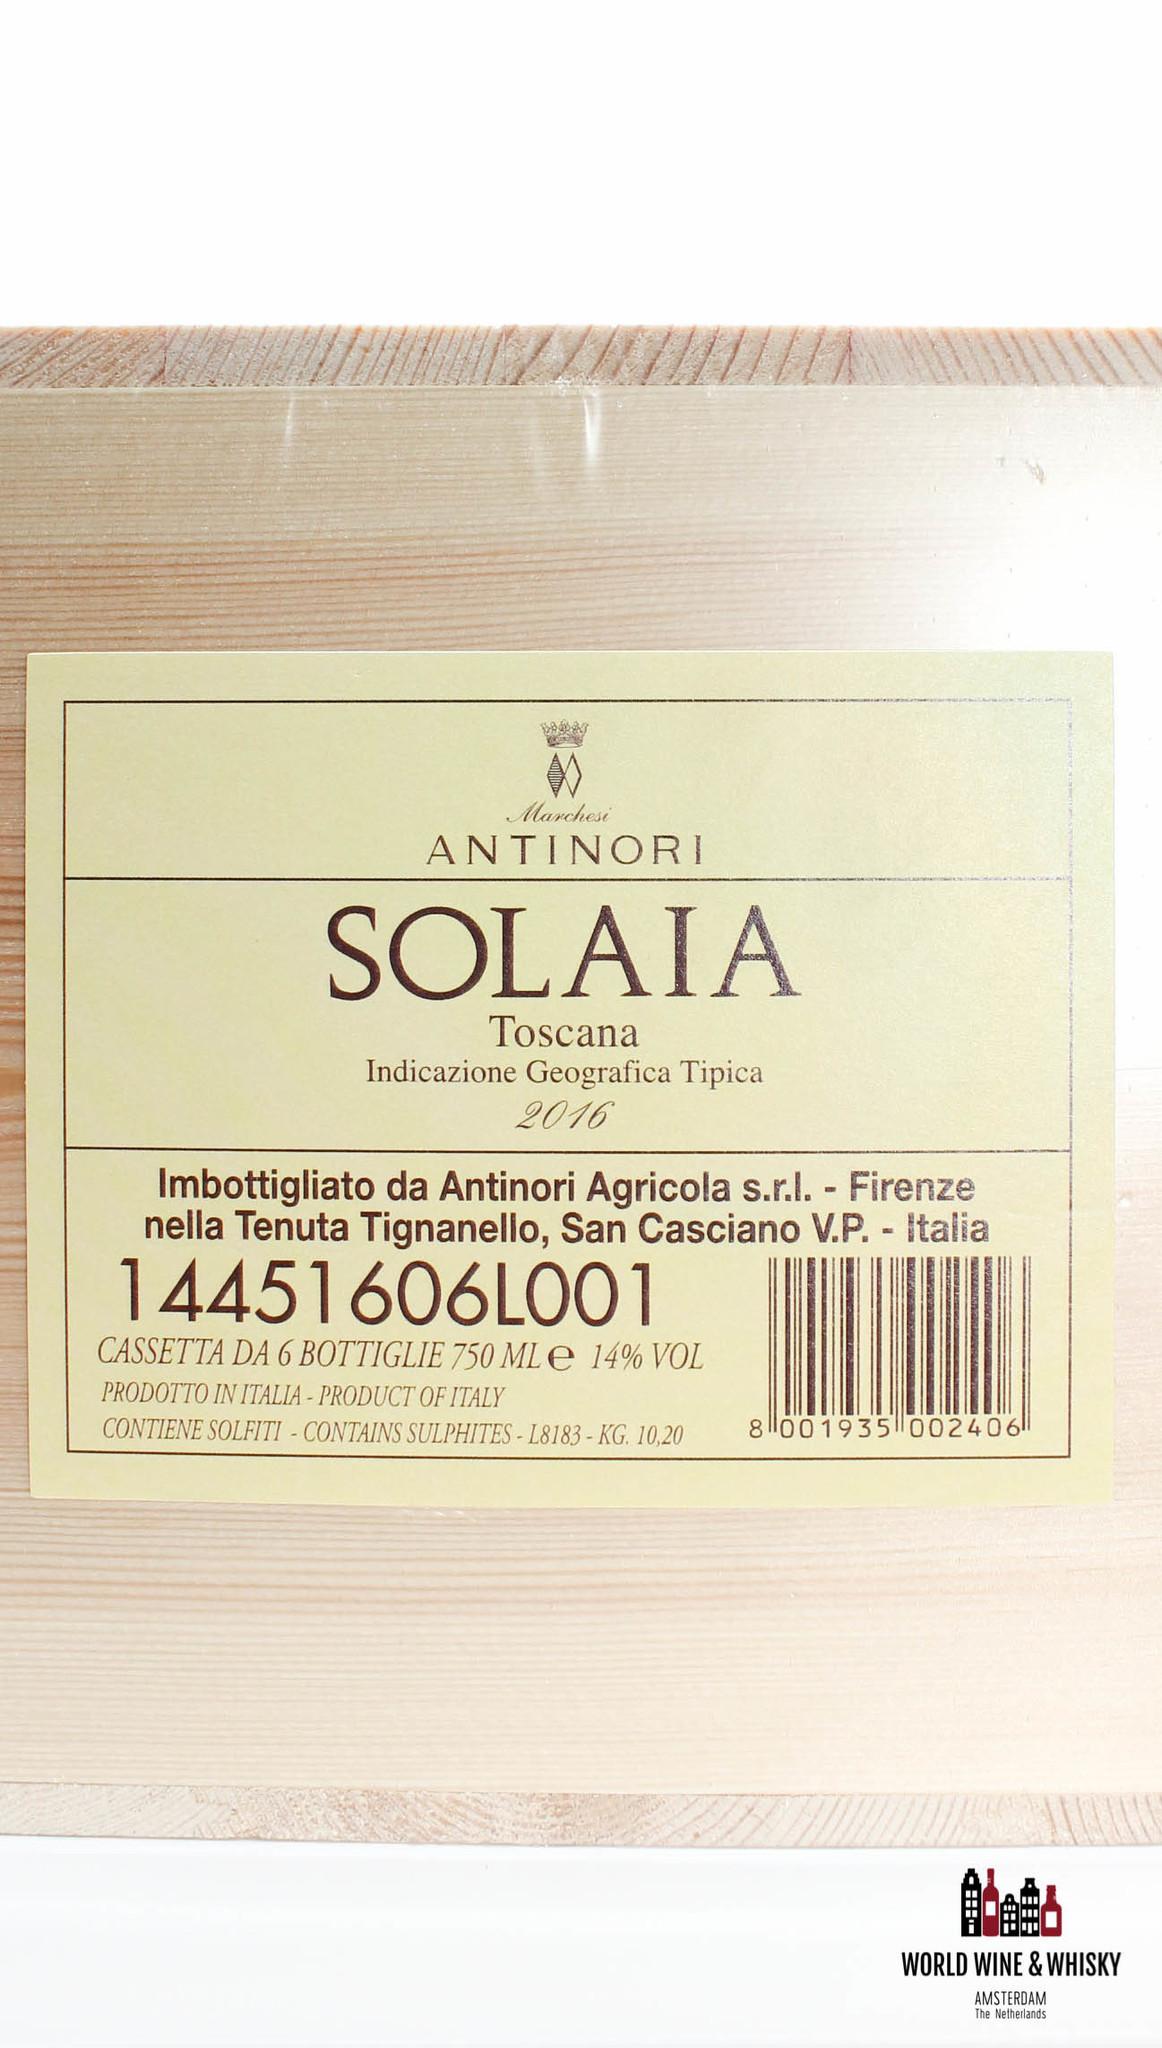 Solaia Antinori Solaia Marchesi Antinori 2016 (in OWC)